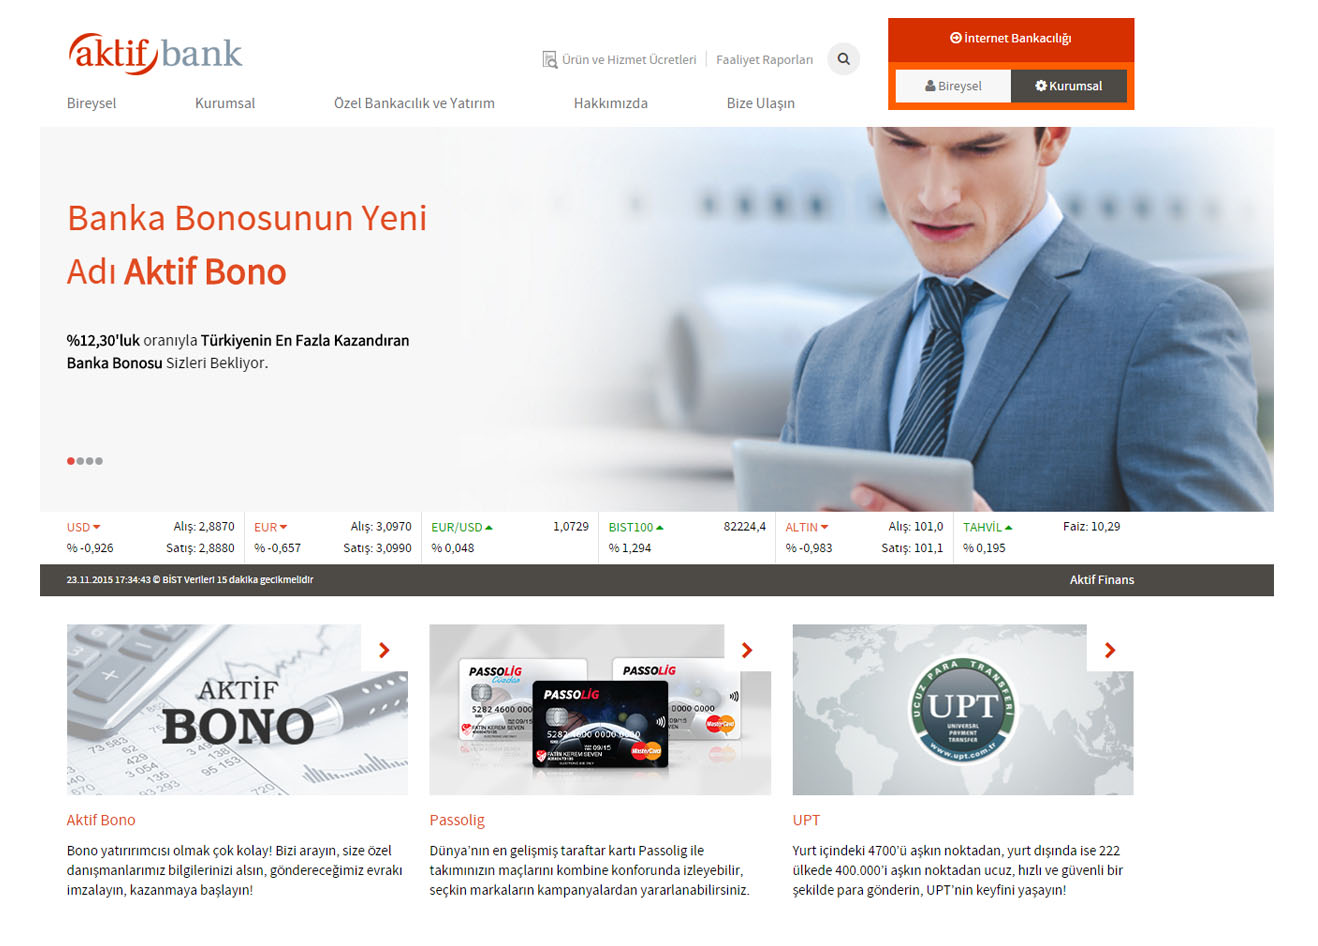 AKTİF BANK SHAREPOINT 2013 KURUMSAL WEB SİTESİ